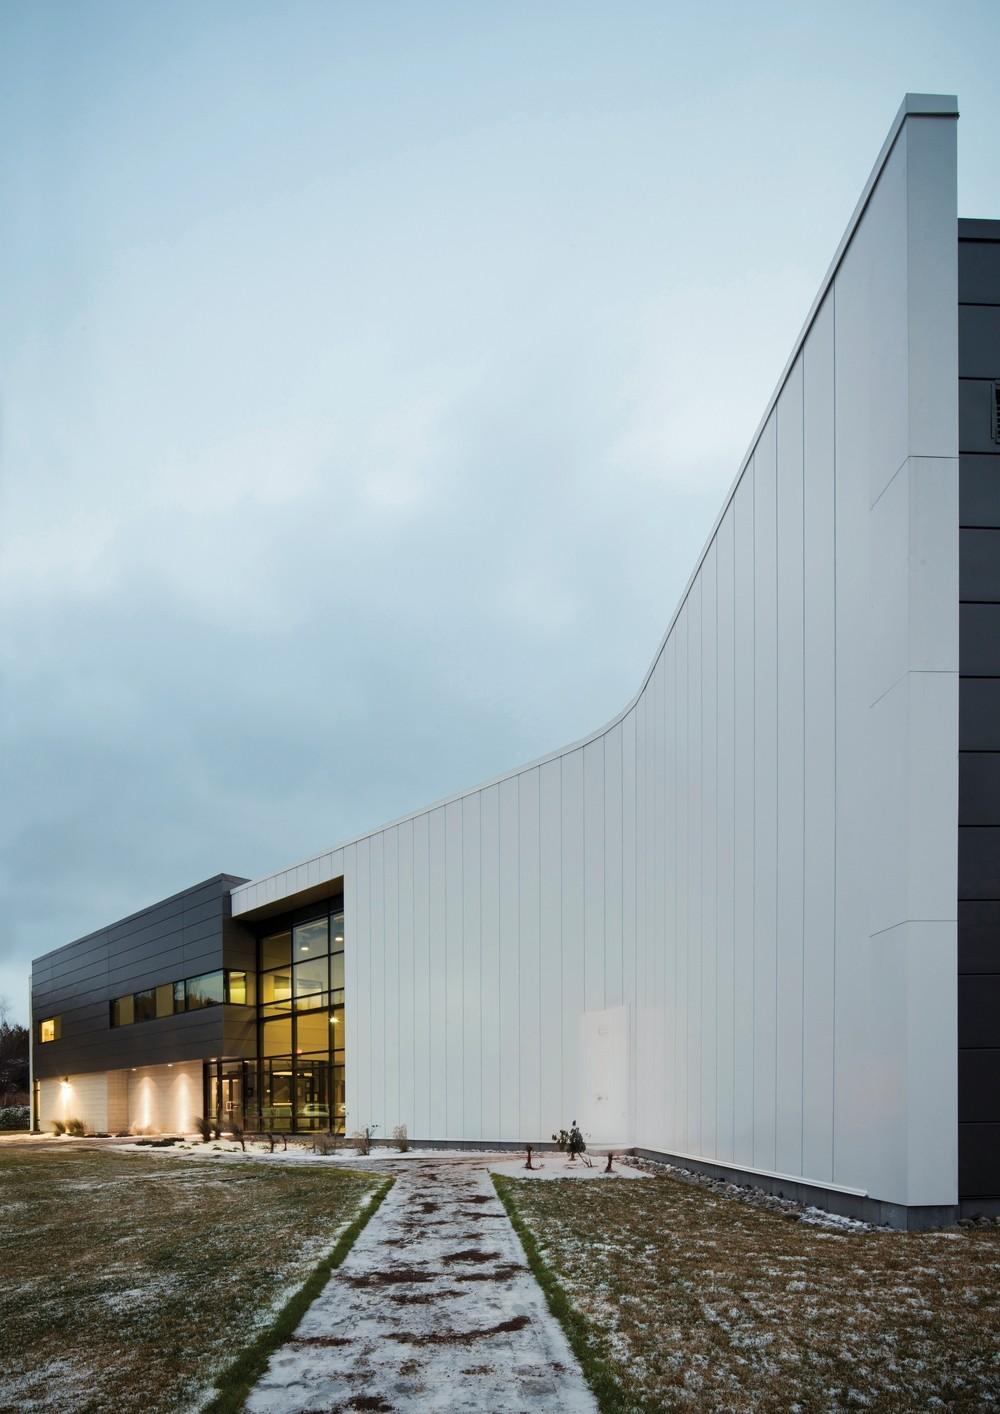 Centro de Especialidades Tecnológicas Físicas de Québec / bisson | associés + Carl Charron Architecte, © Stéphane Groleau